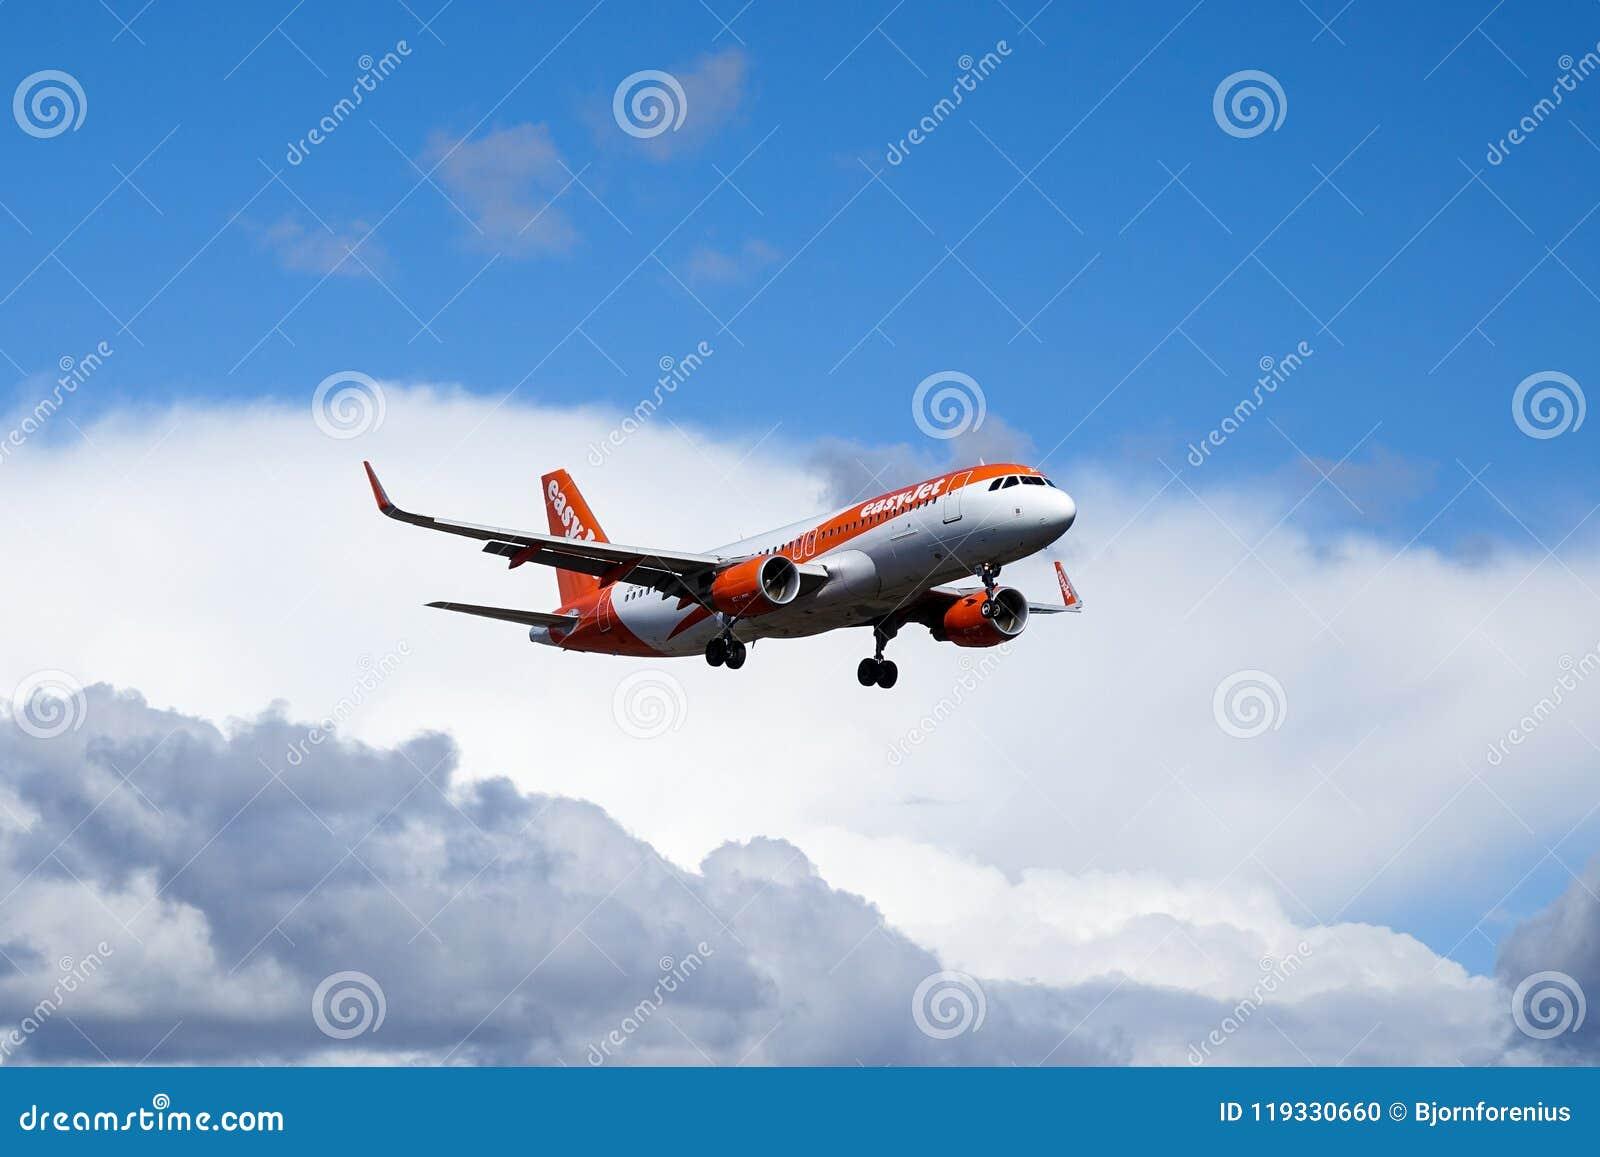 Easyjet, Airbus A320 - 214 que voam